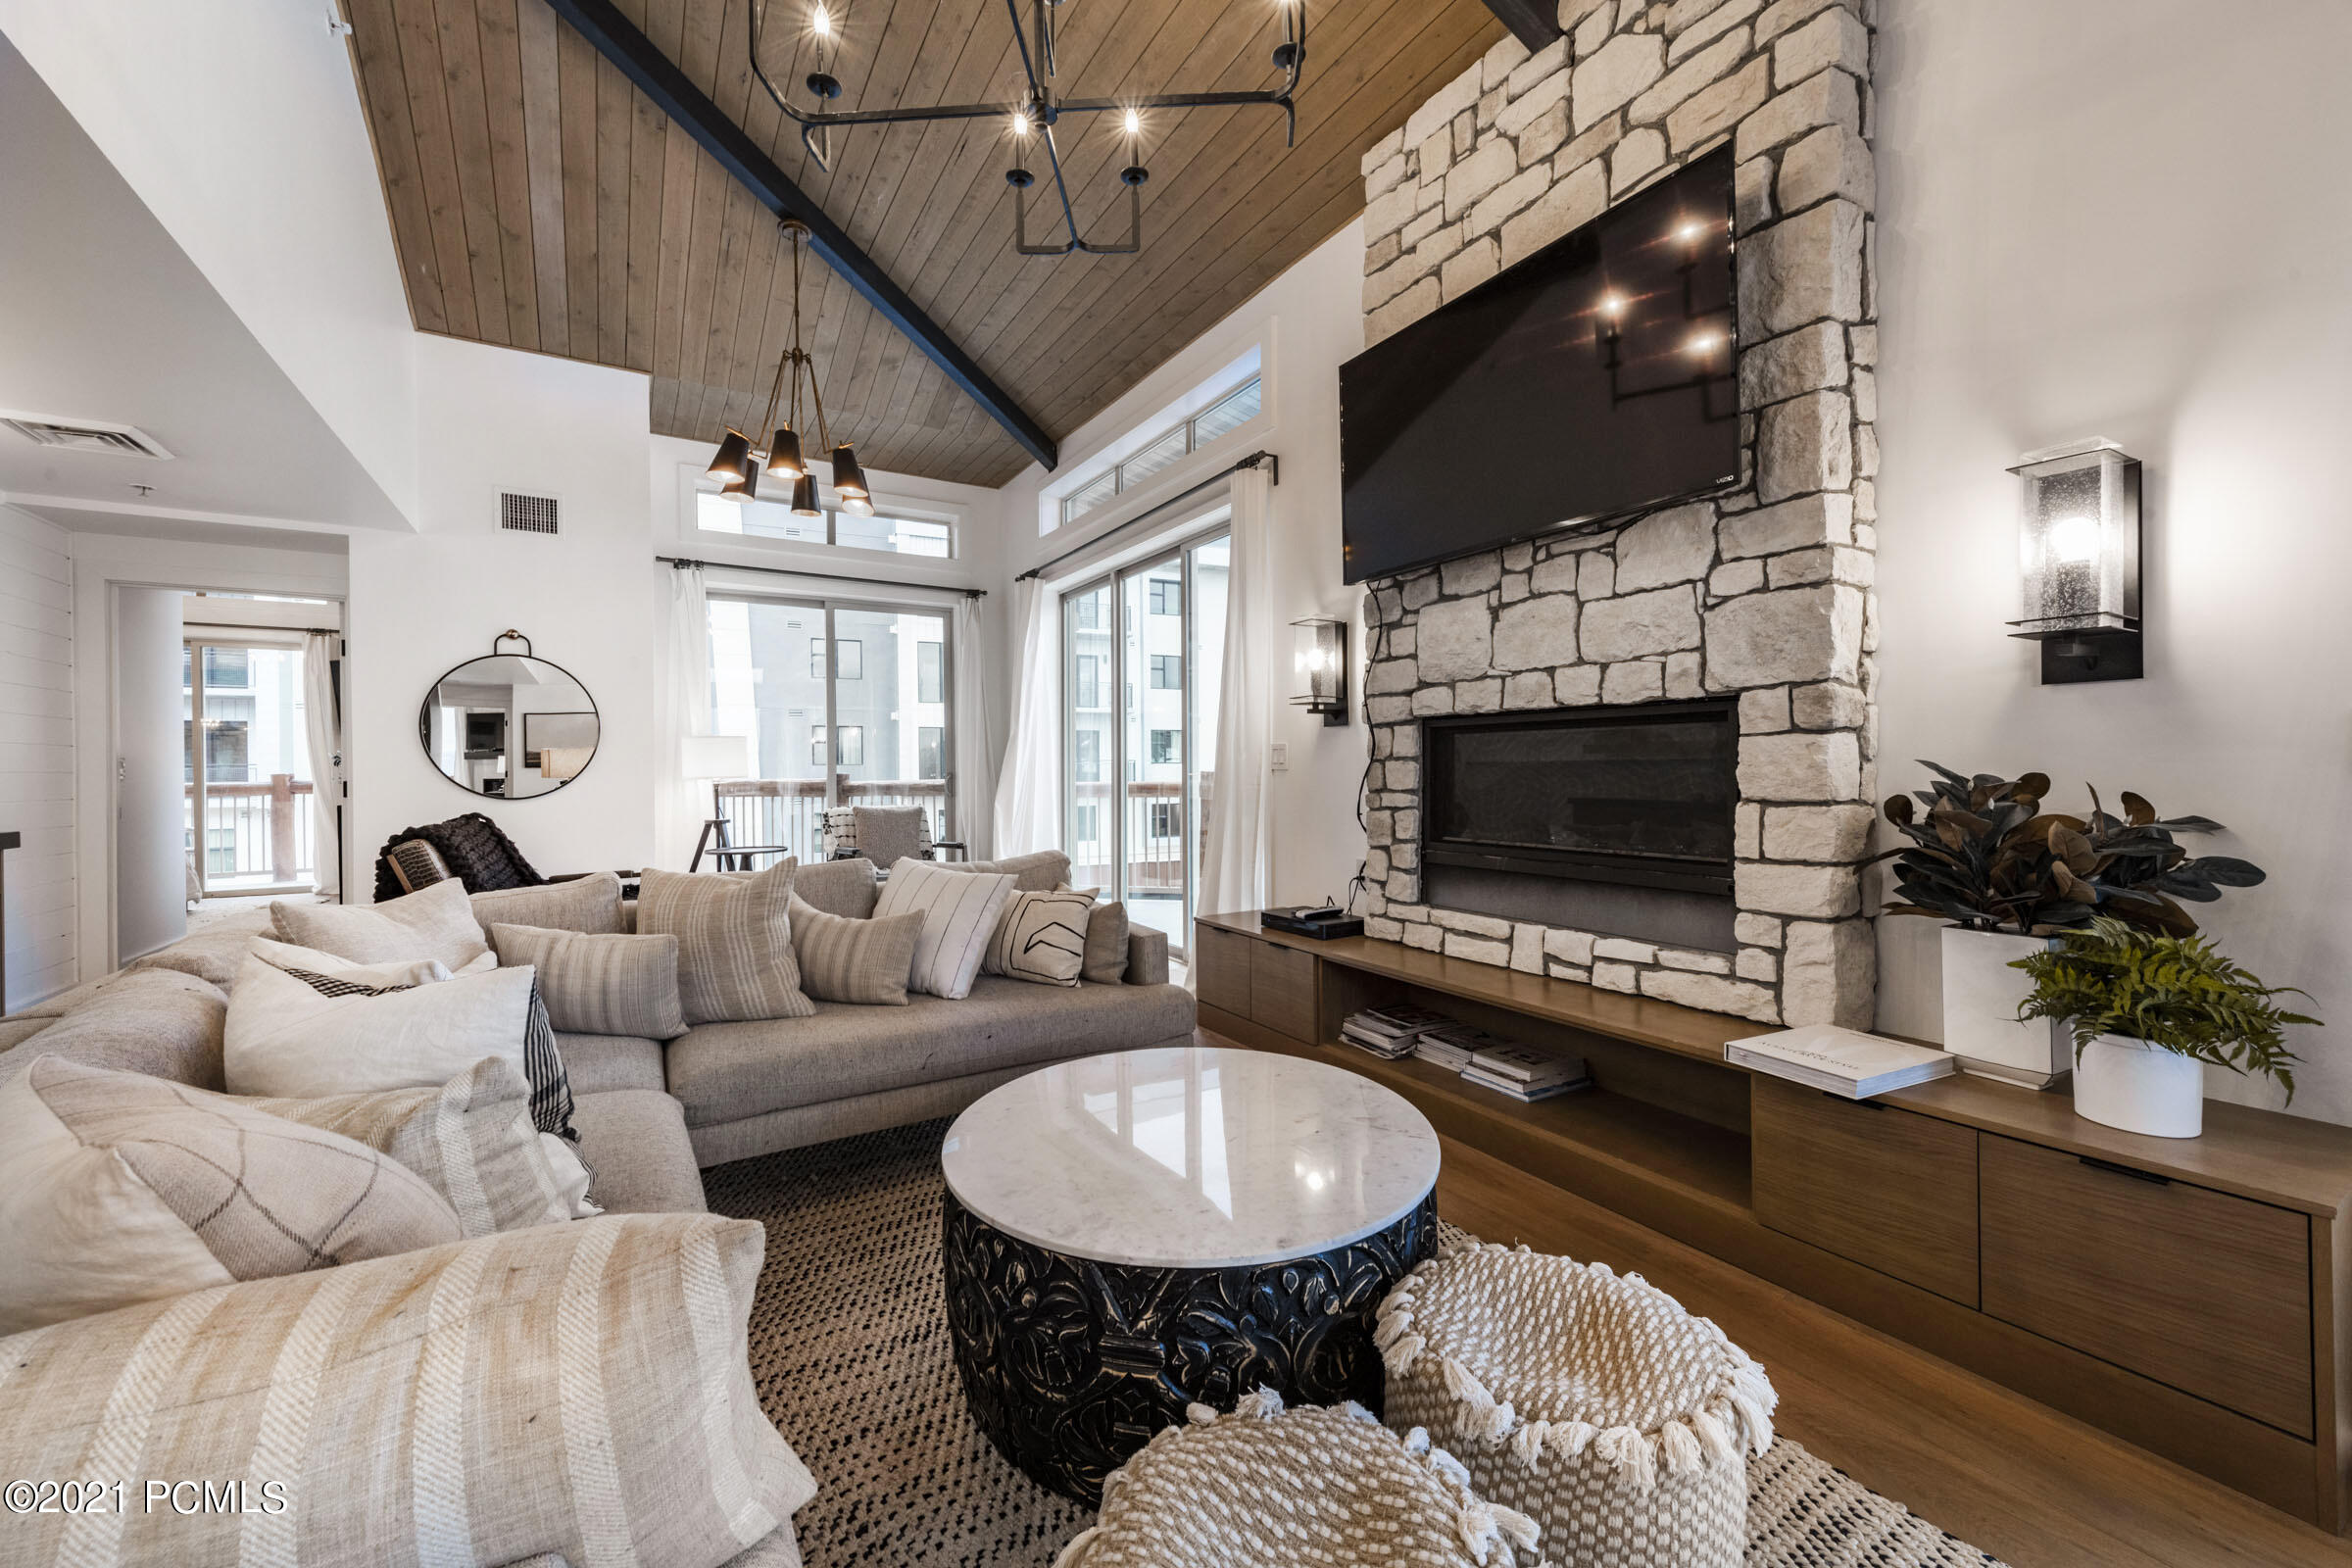 3000 Canyons Resort Drive, Park City, Utah 84098, 4 Bedrooms Bedrooms, ,4 BathroomsBathrooms,Condominium,For Sale,Canyons Resort,12104245